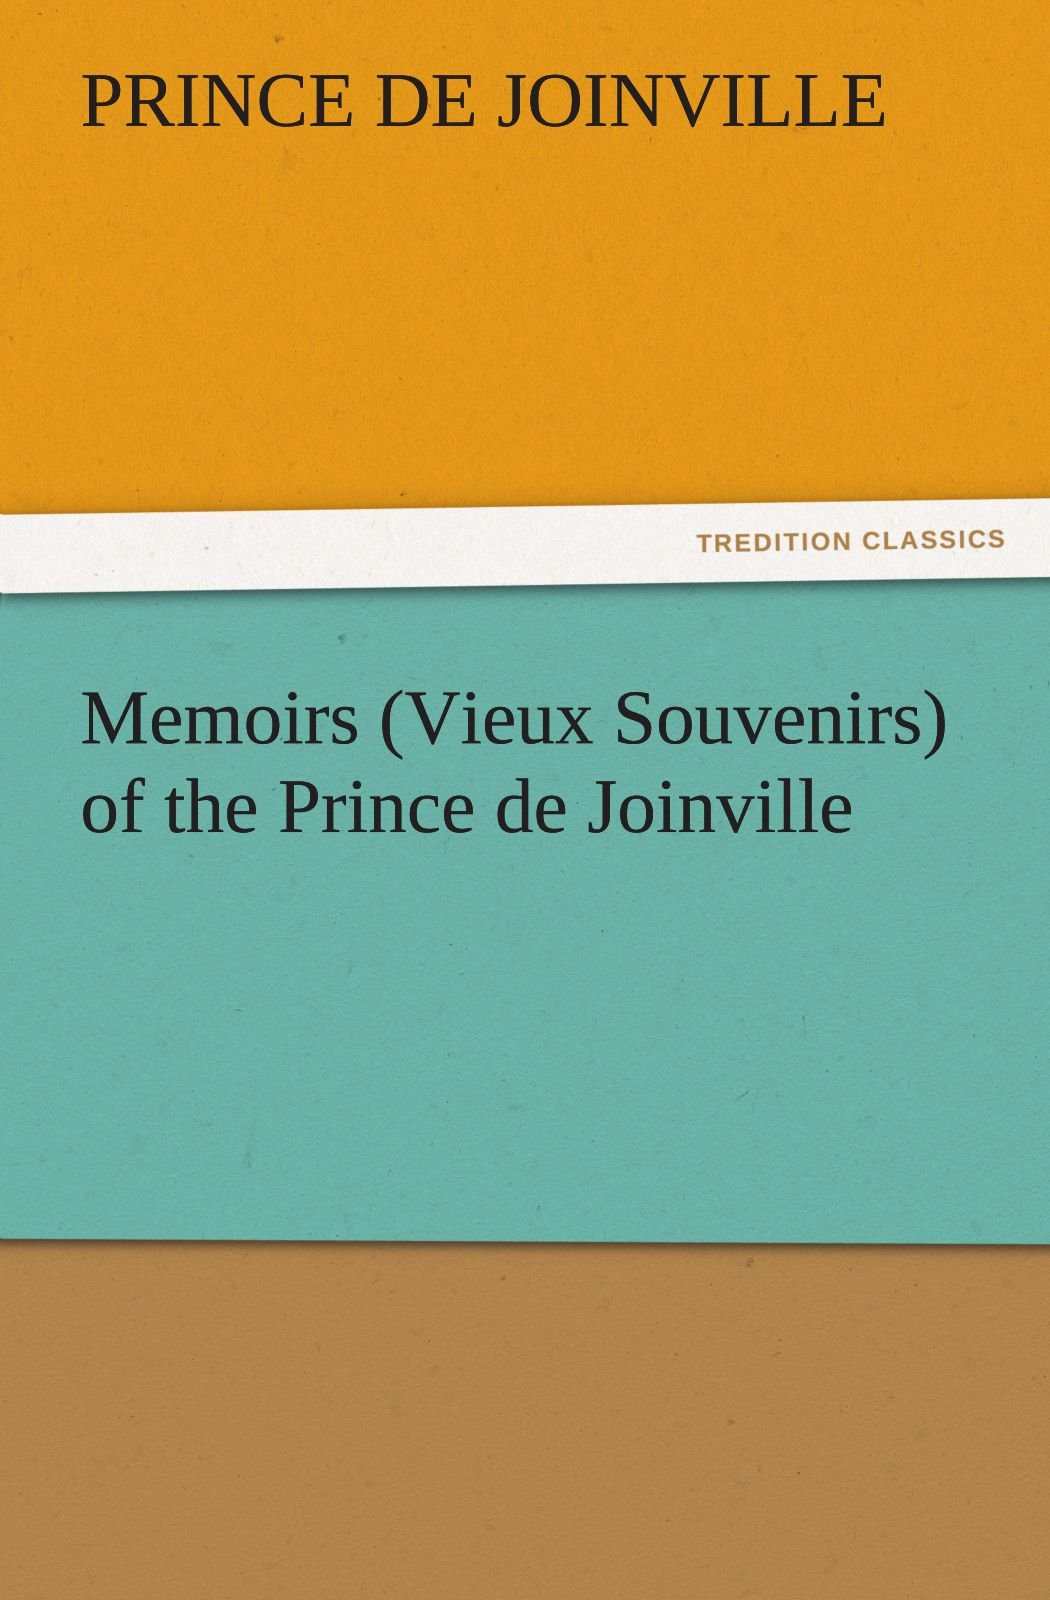 Download Memoirs (Vieux Souvenirs) of the Prince de Joinville (TREDITION CLASSICS) ebook